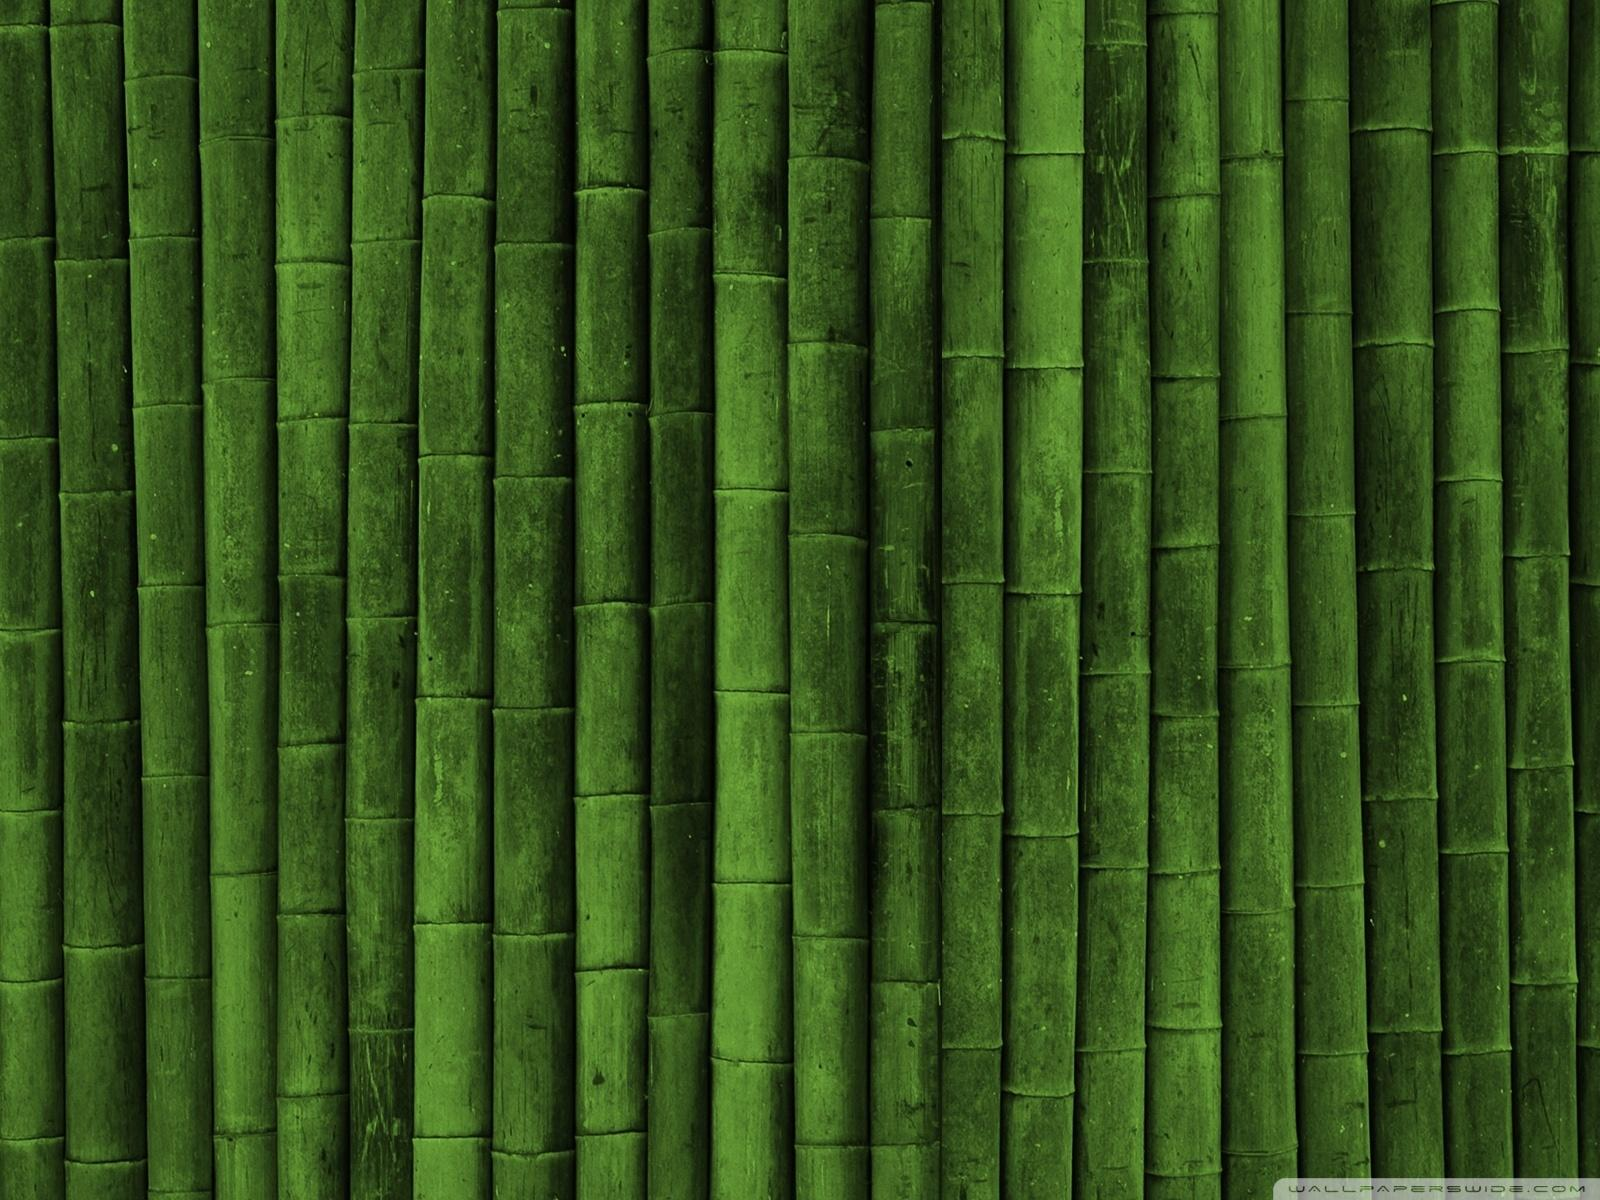 bamboowallwallpaperhdwall